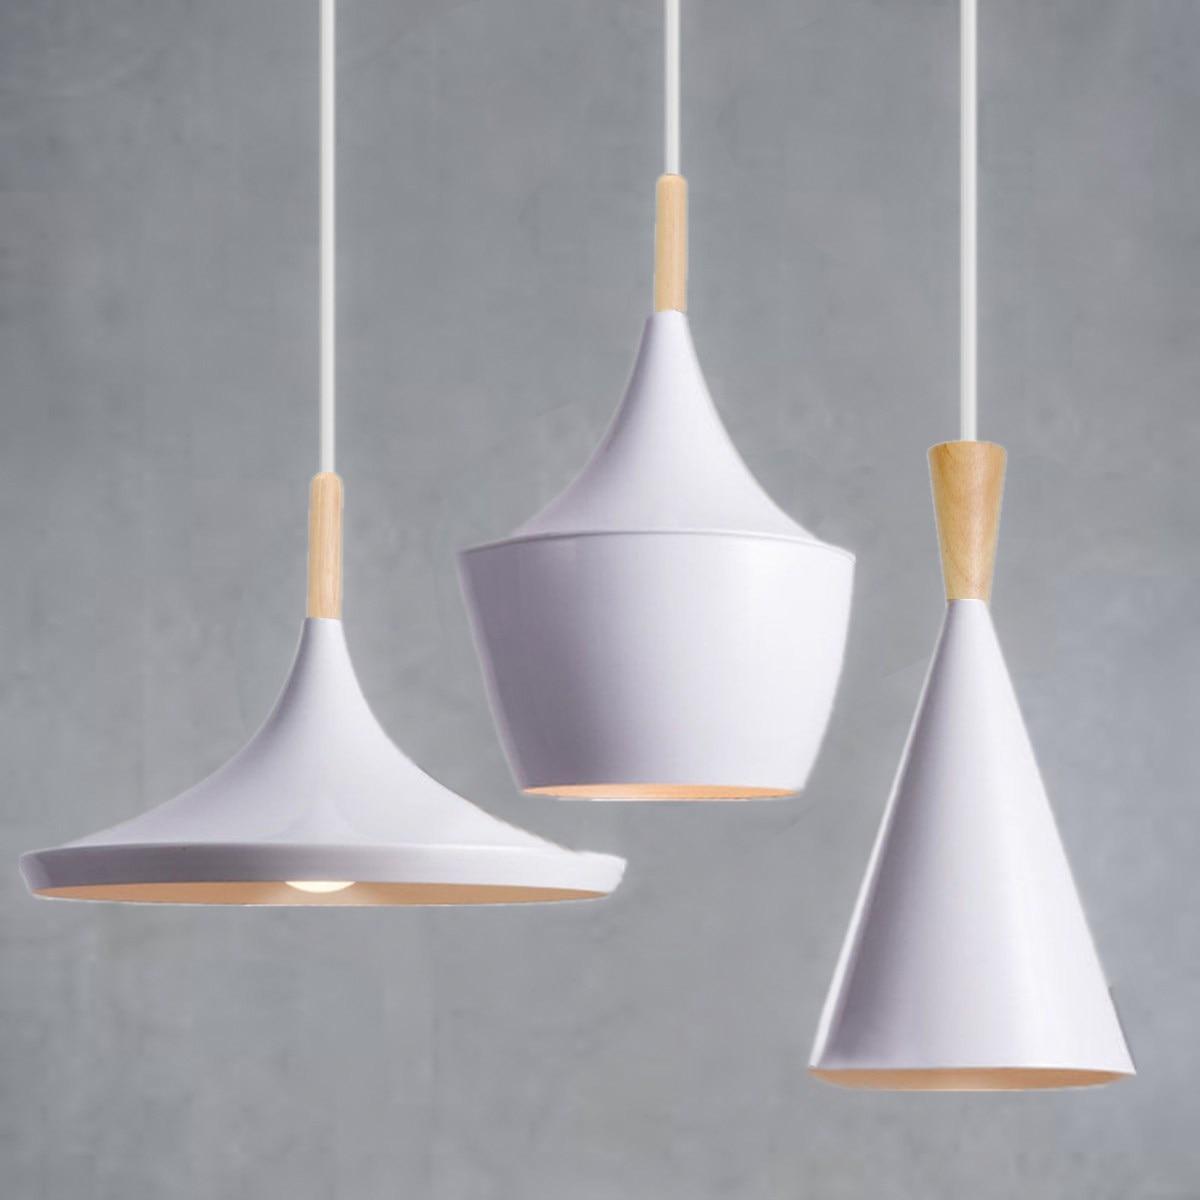 3 Styles Modern Pendant Light Wood Metal E27 Socket Loft